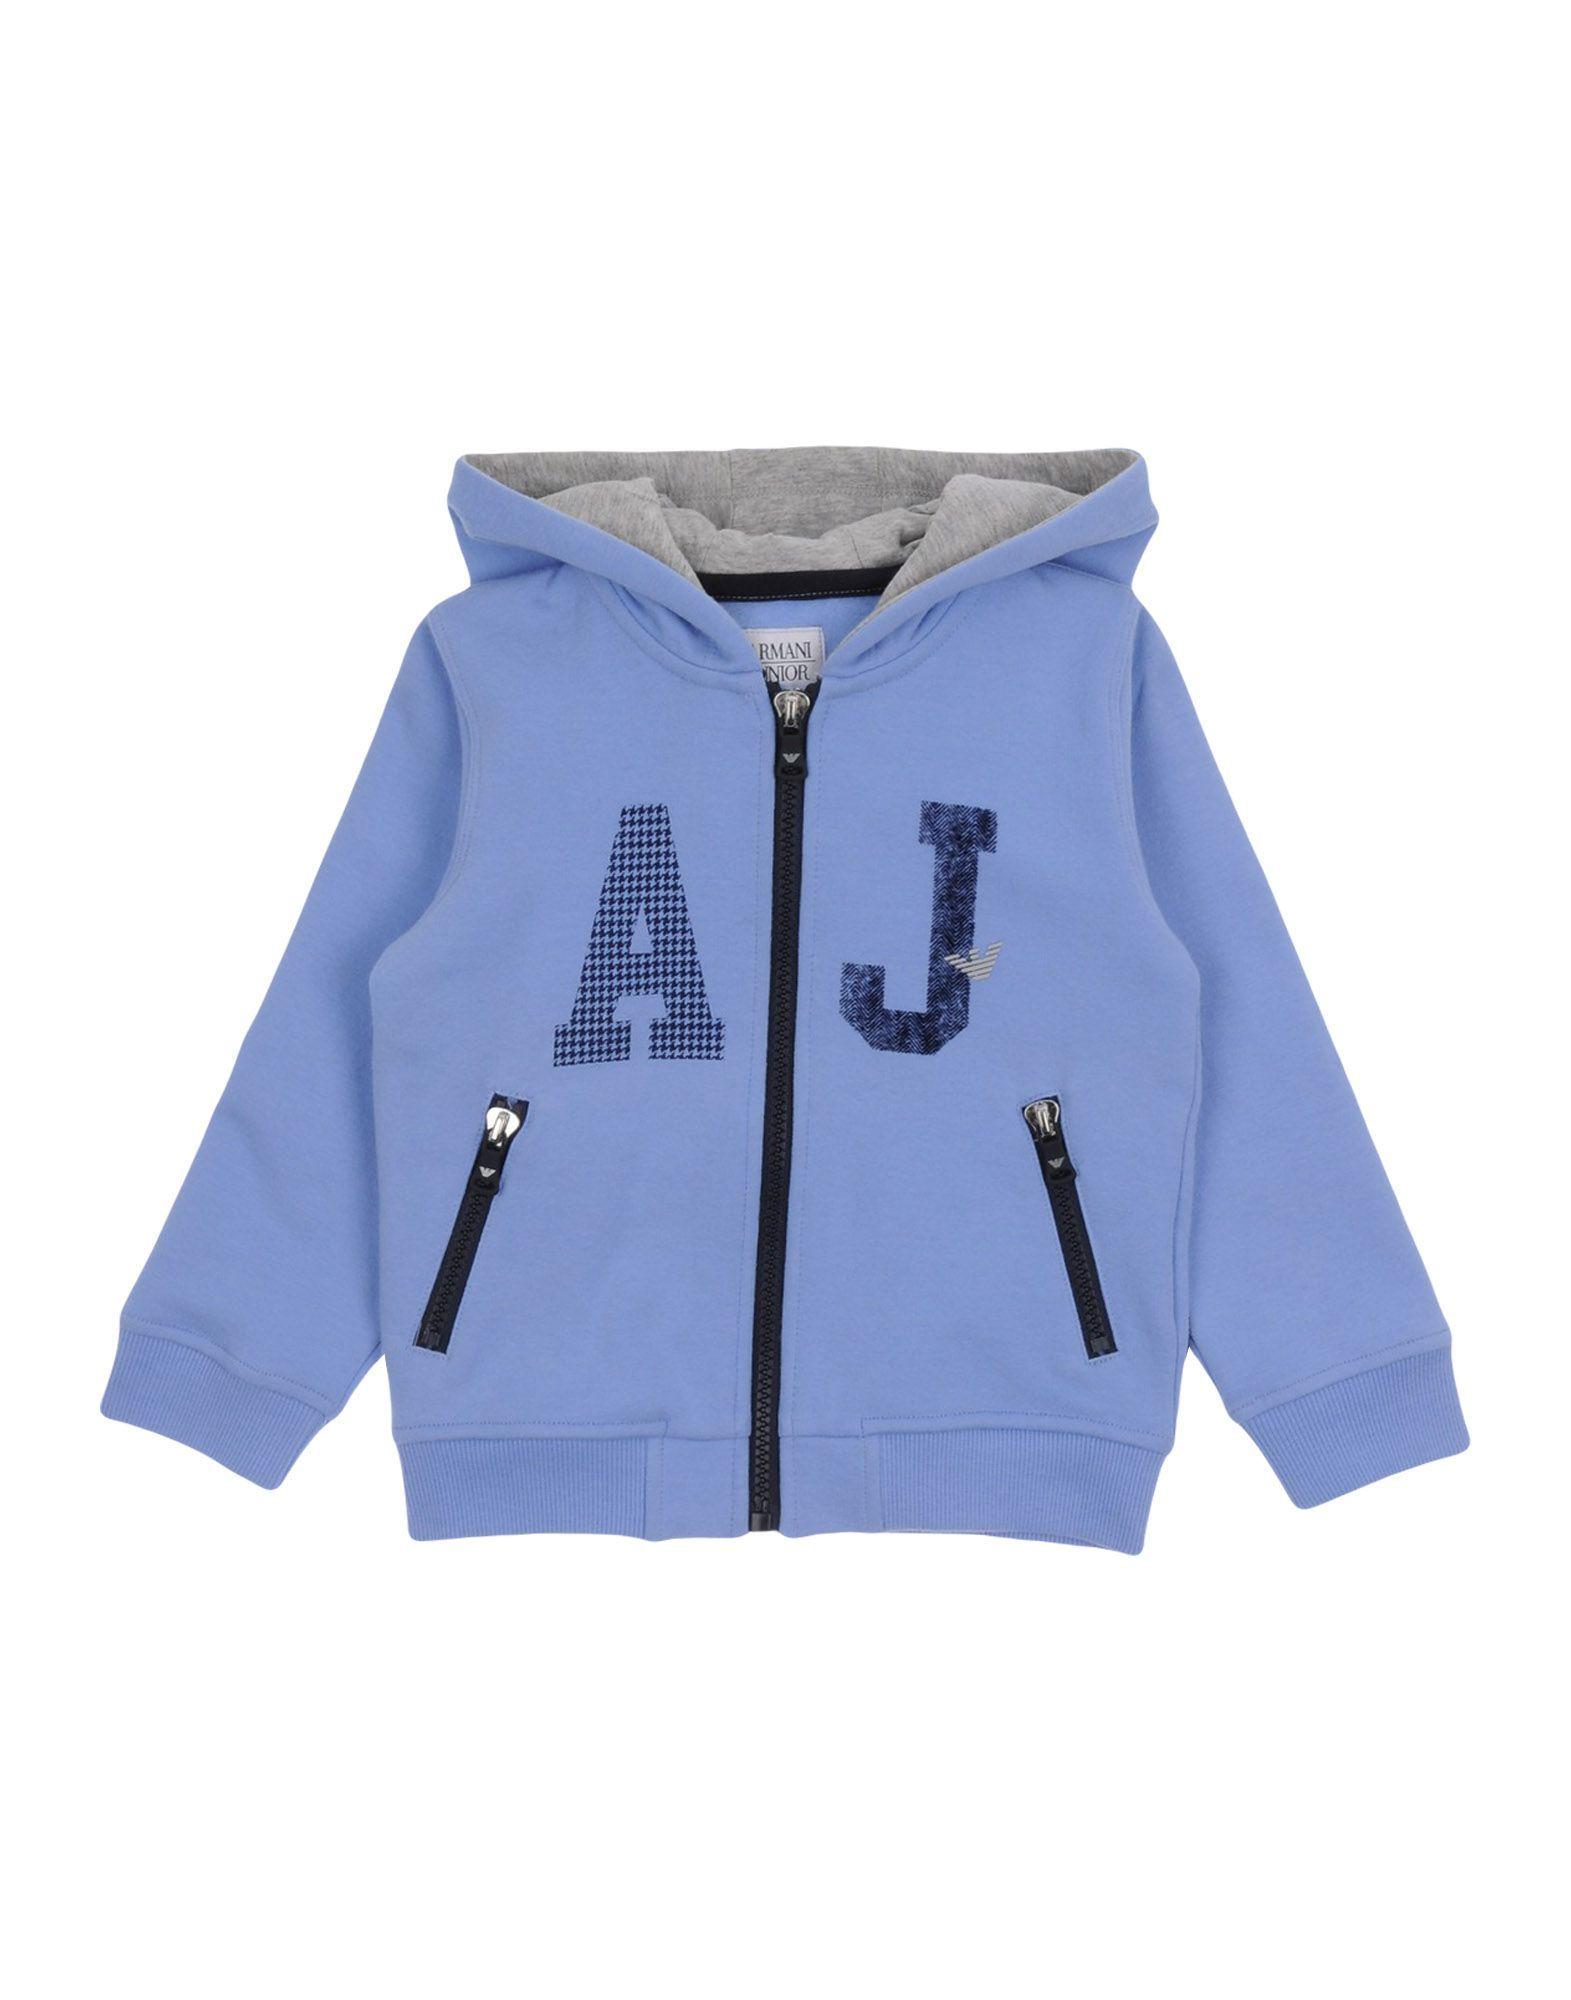 TOPWEAR Armani Junior Blue Boy Cotton